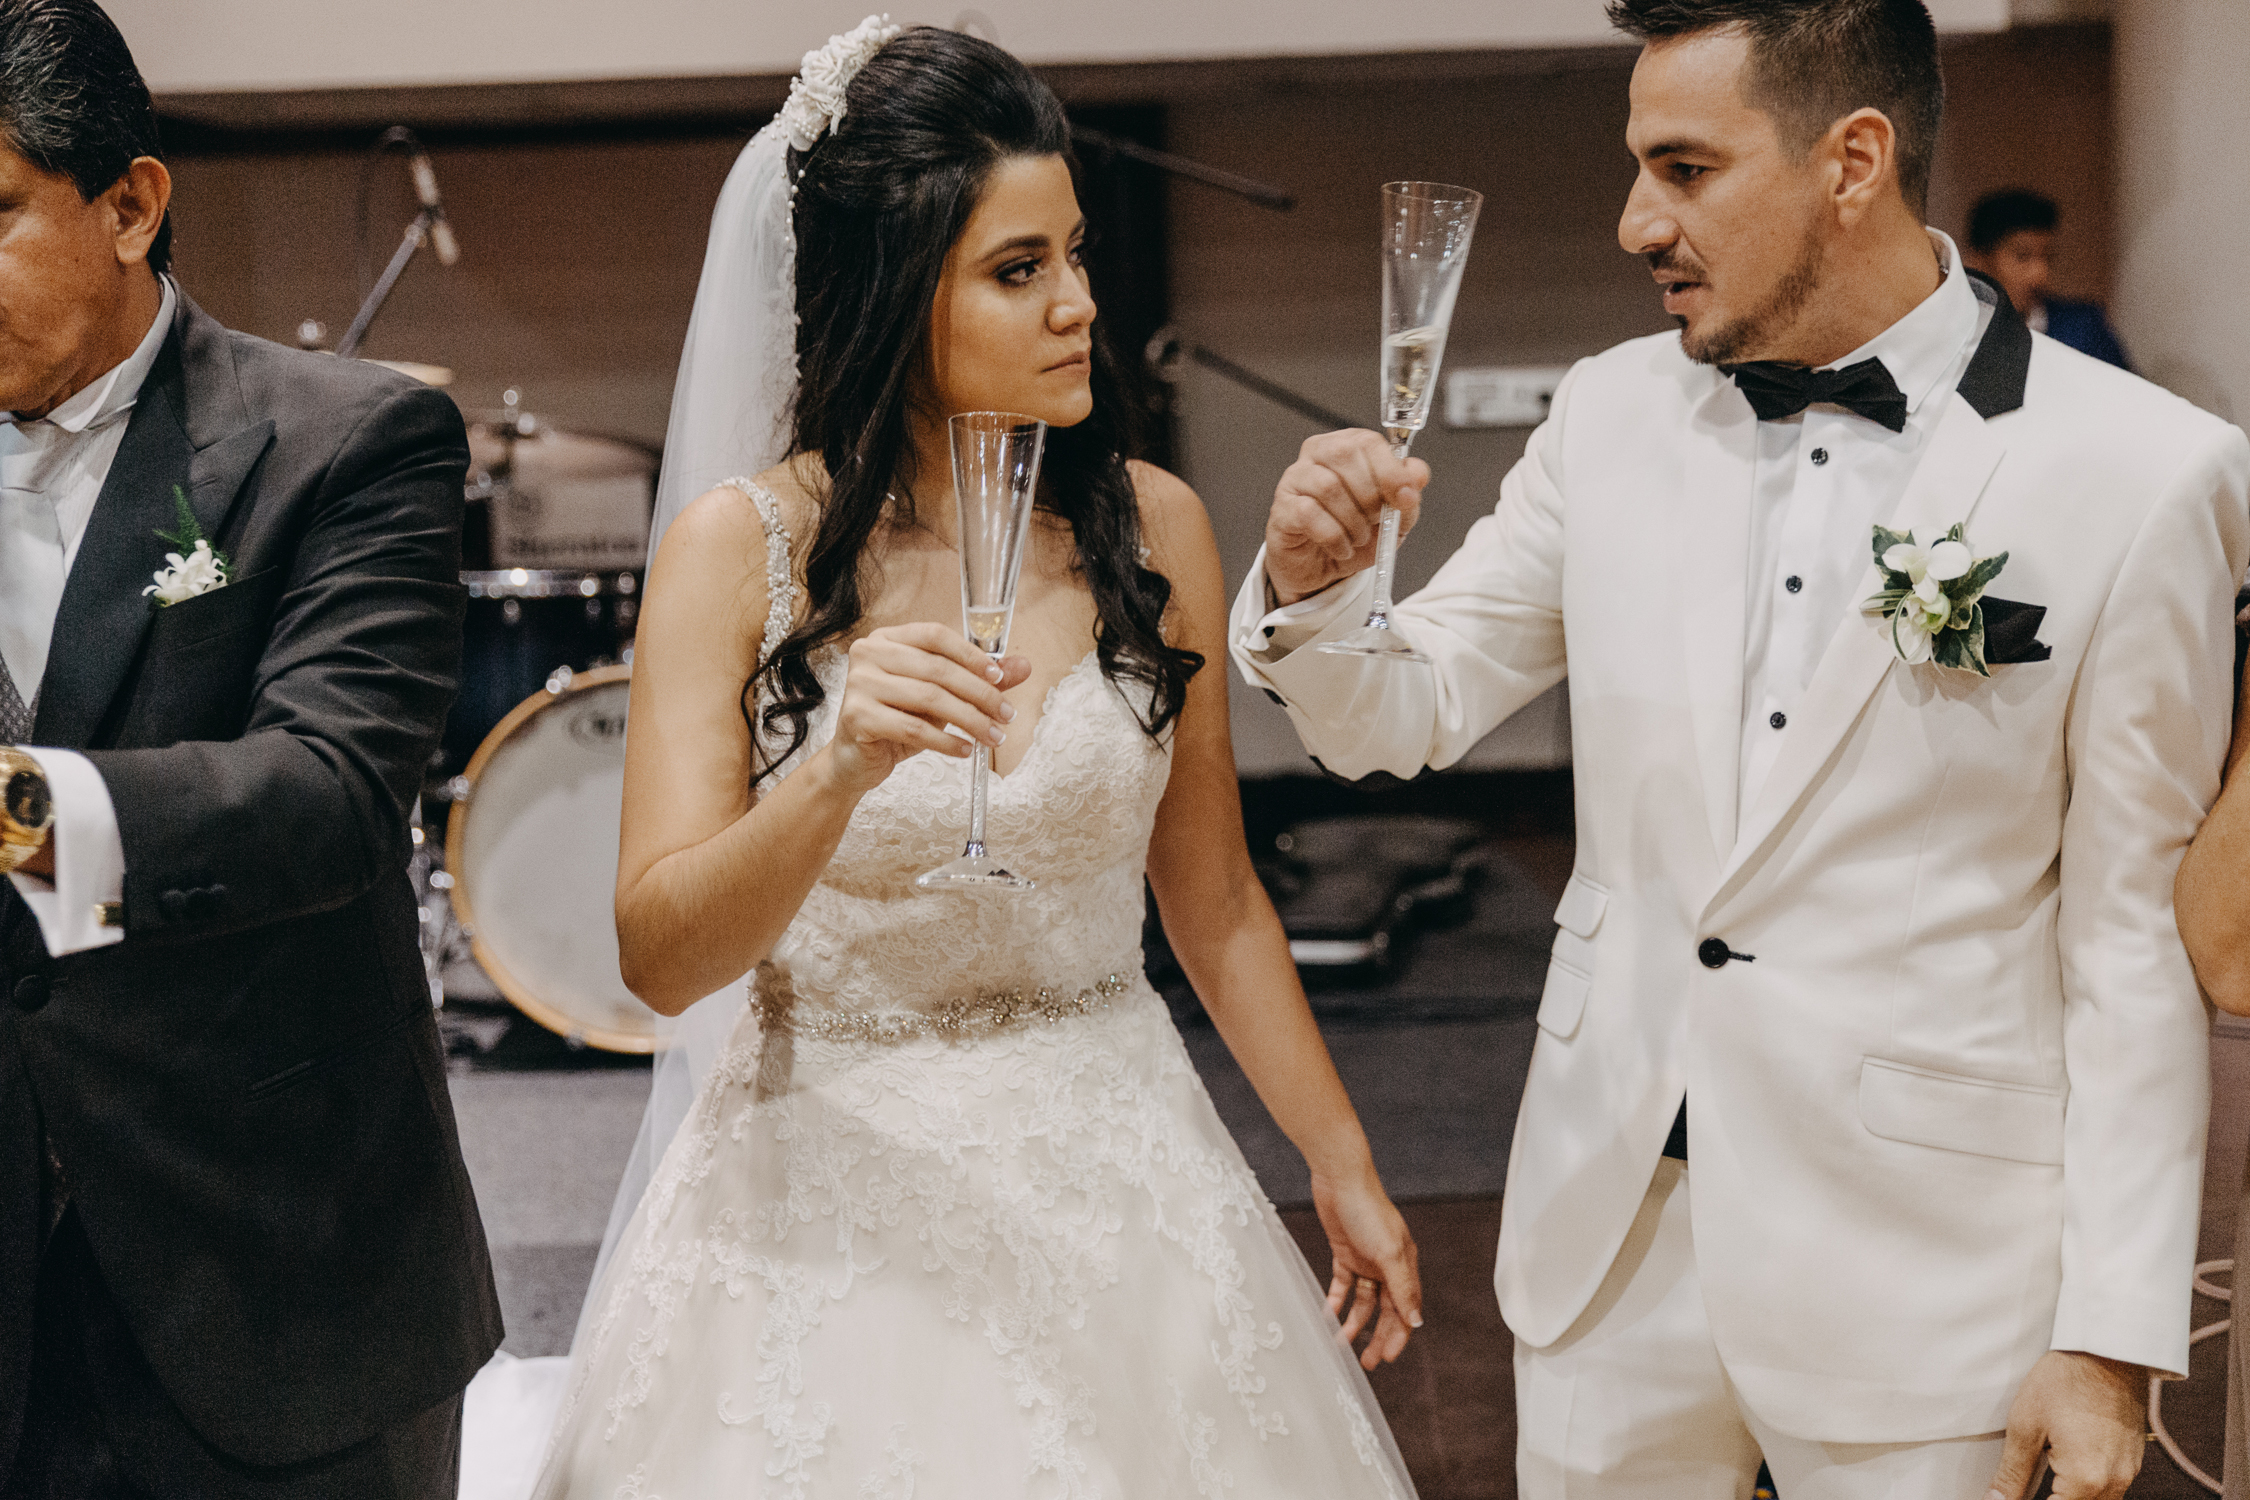 Michelle-Agurto-Fotografia-Bodas-Ecuador-Destination-Wedding-Photographer-Daniela-Dirk-46.JPG